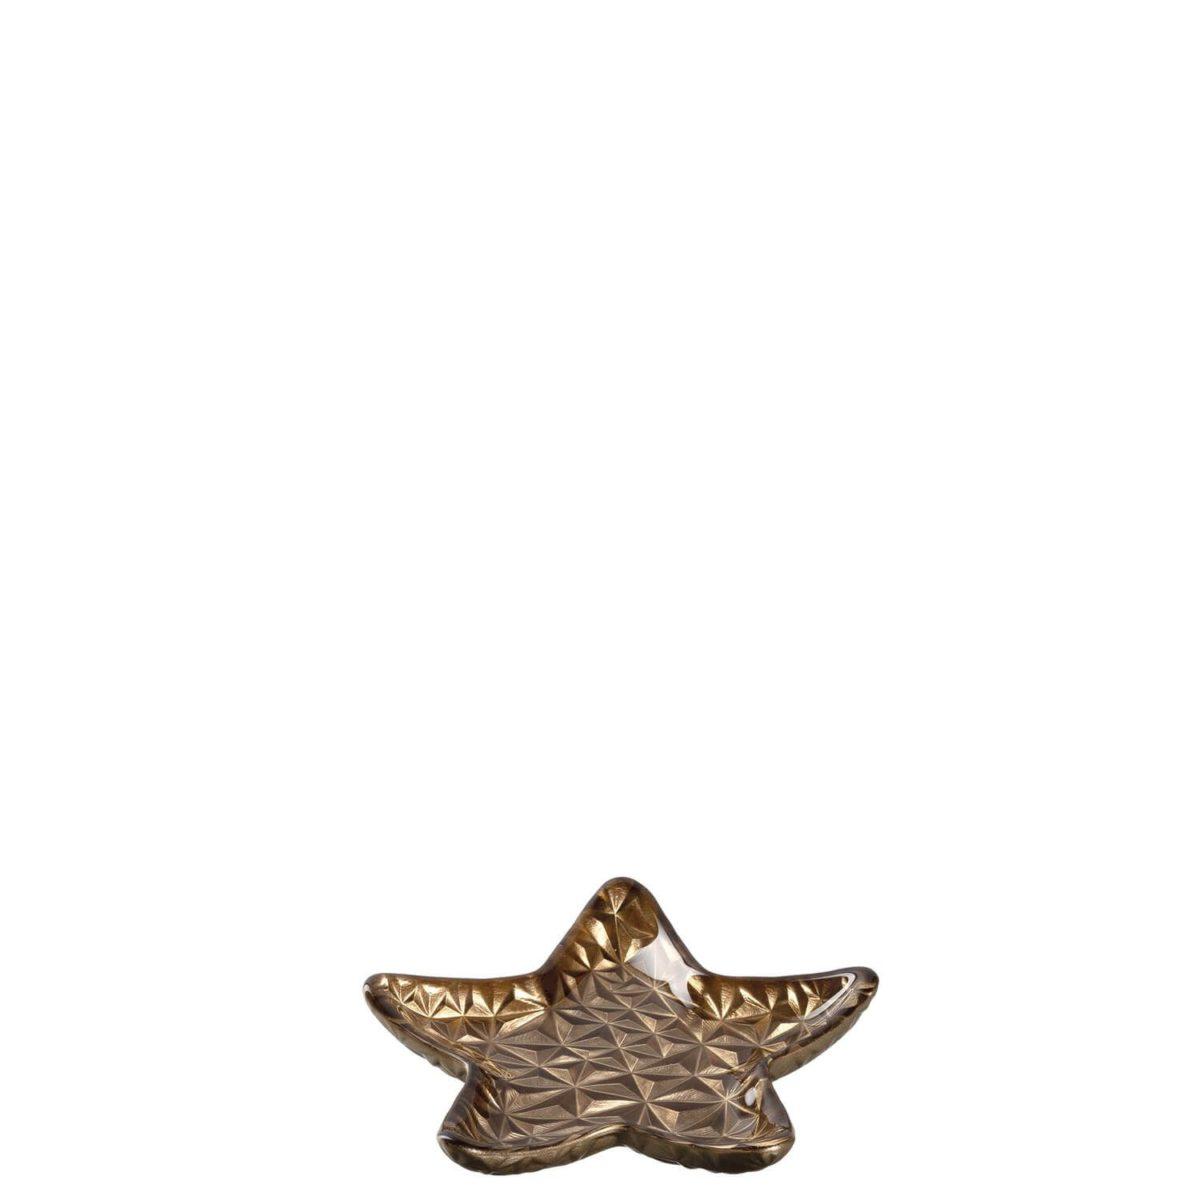 041328 0 k 1200x1200 - Platou Decora brown LEONARDO (L041328)